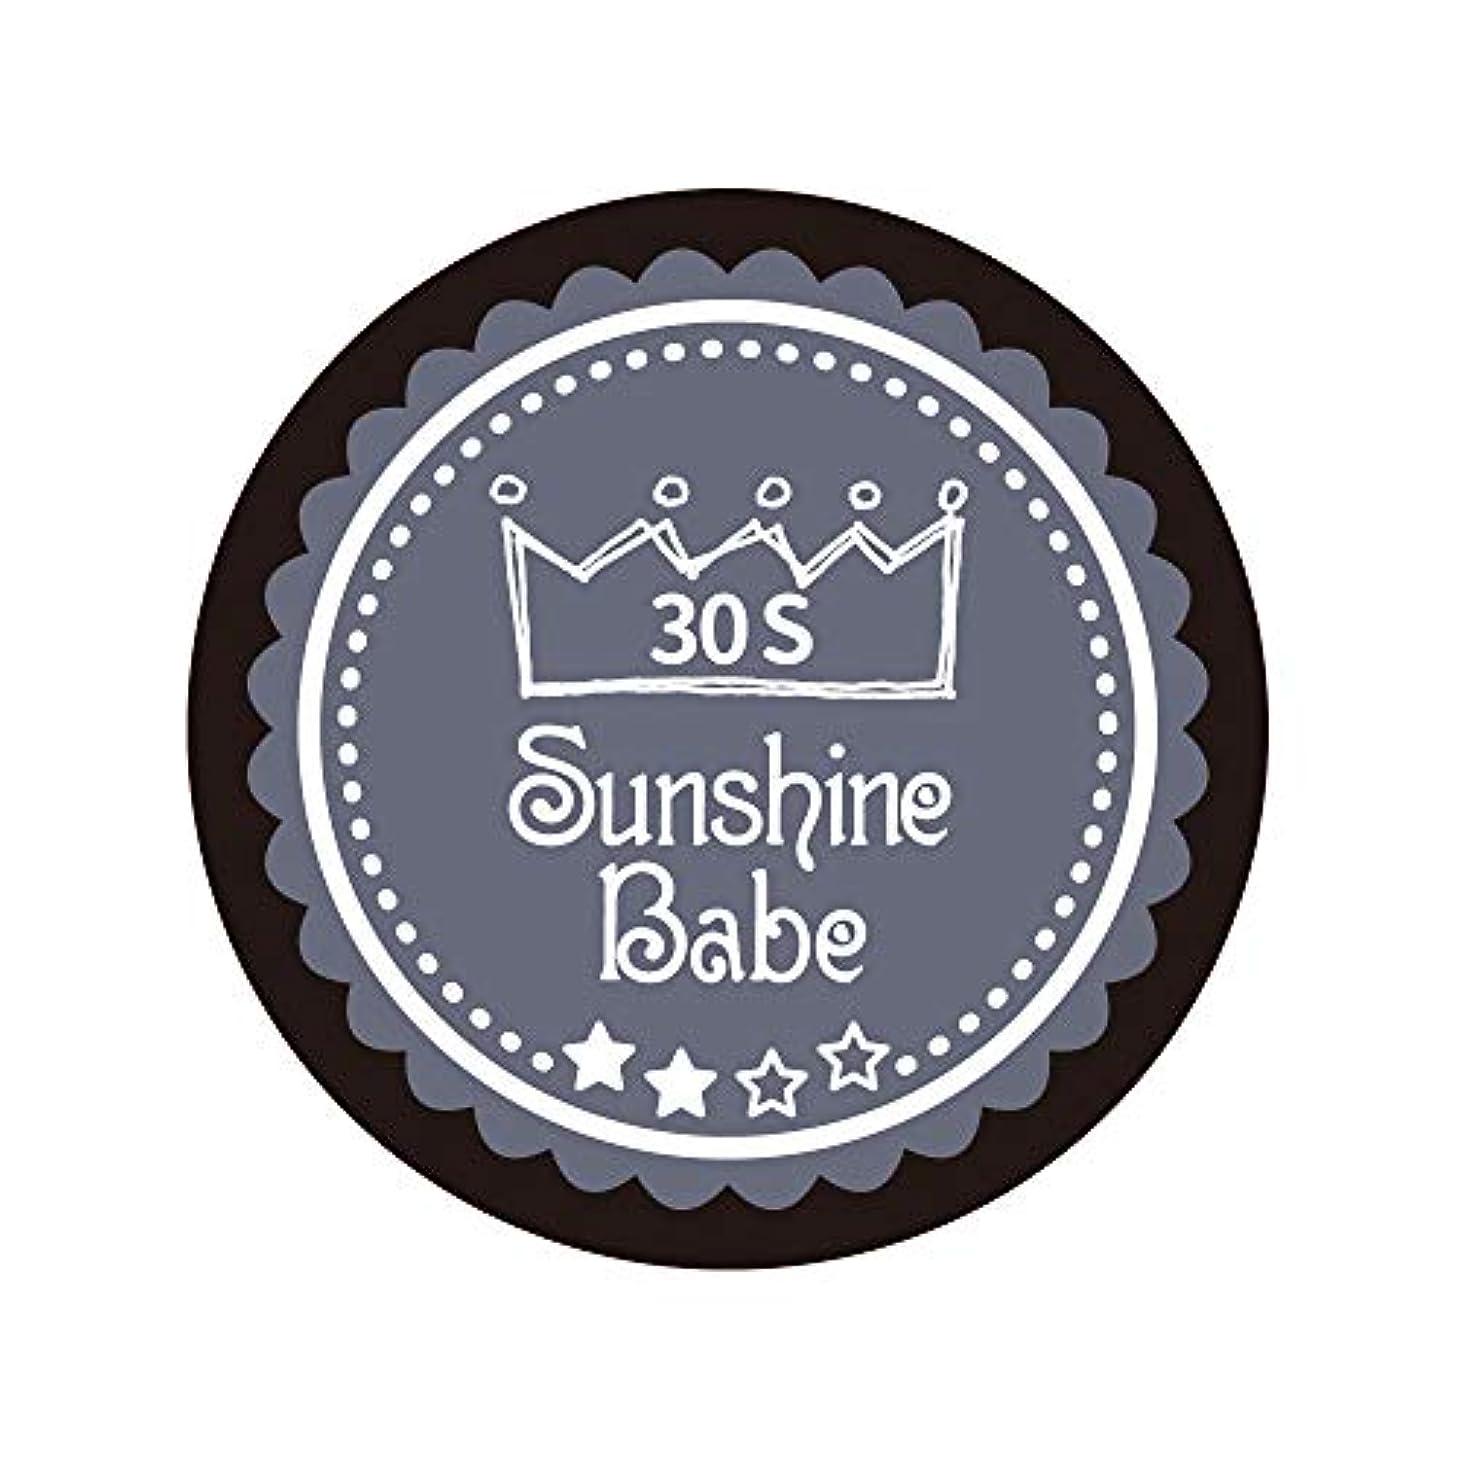 Sunshine Babe カラージェル 30S チャコールグレー 2.7g UV/LED対応